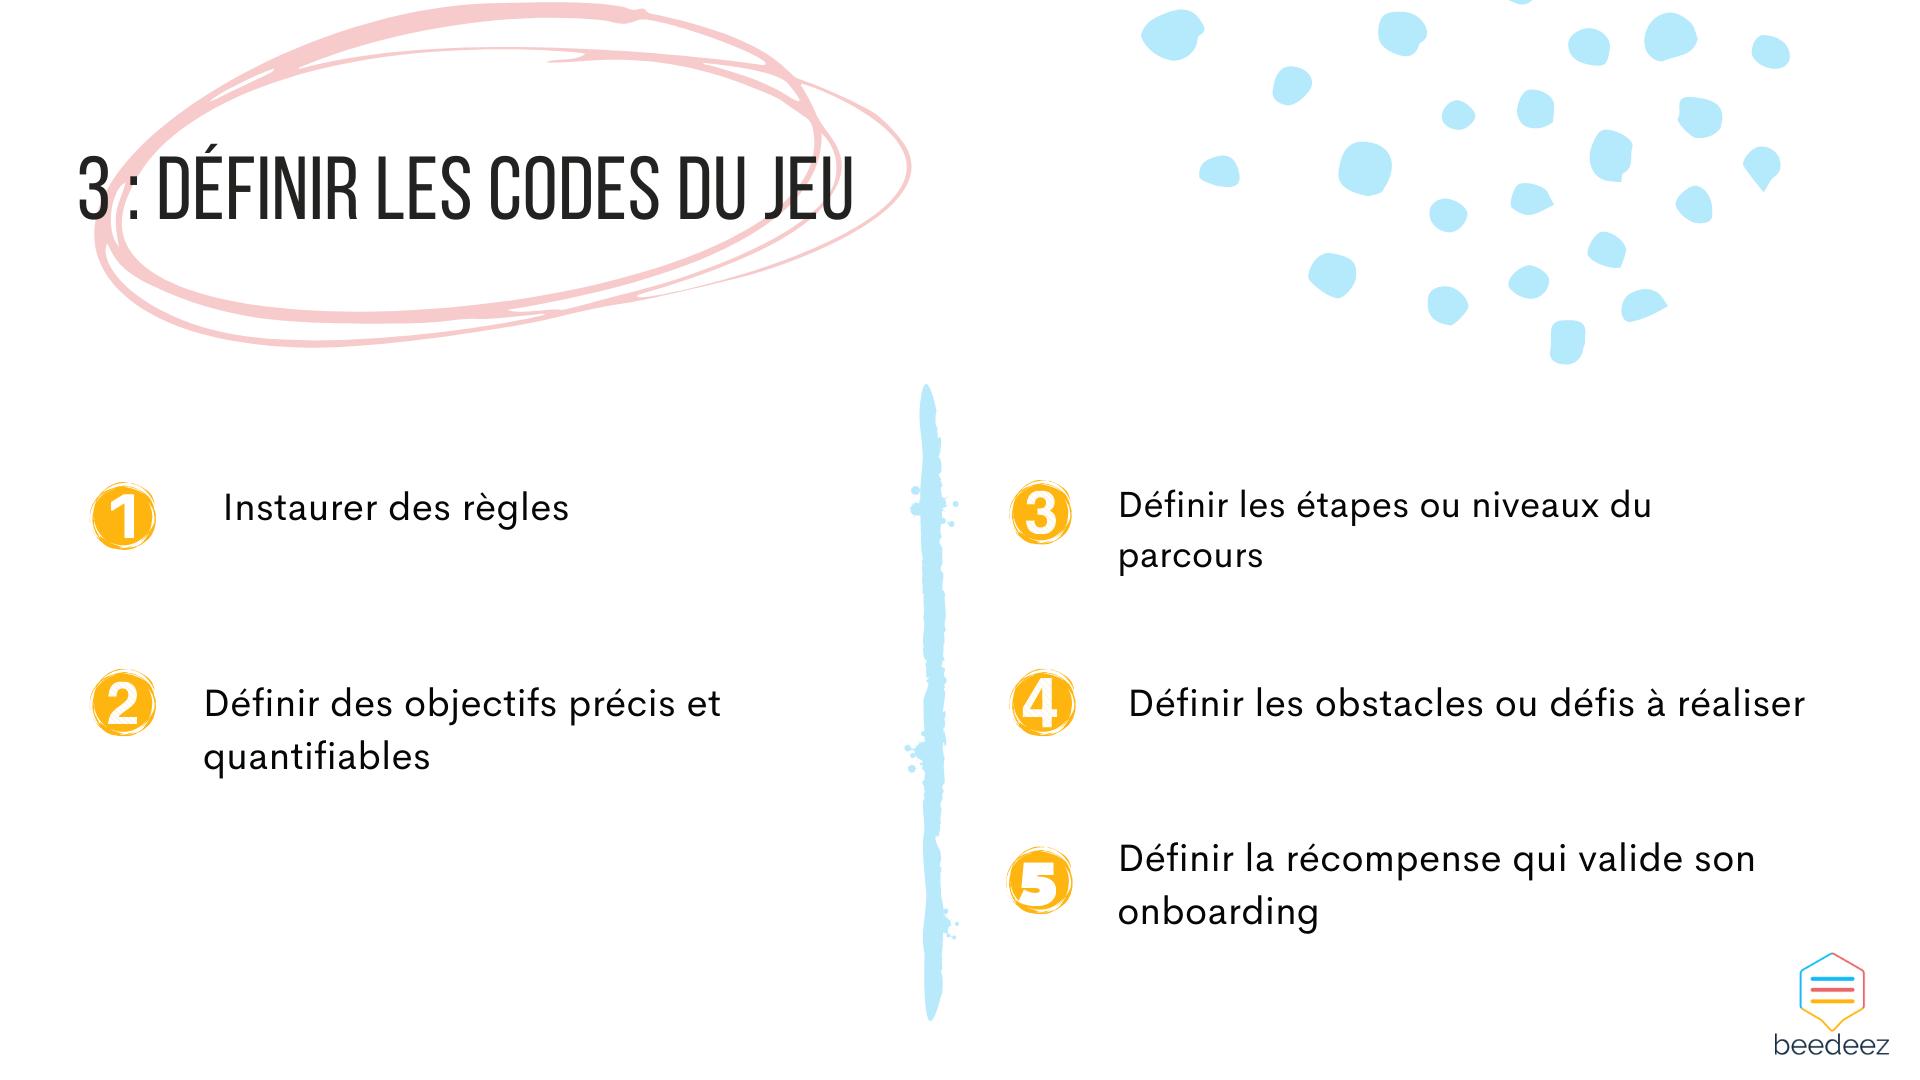 codes du jeu